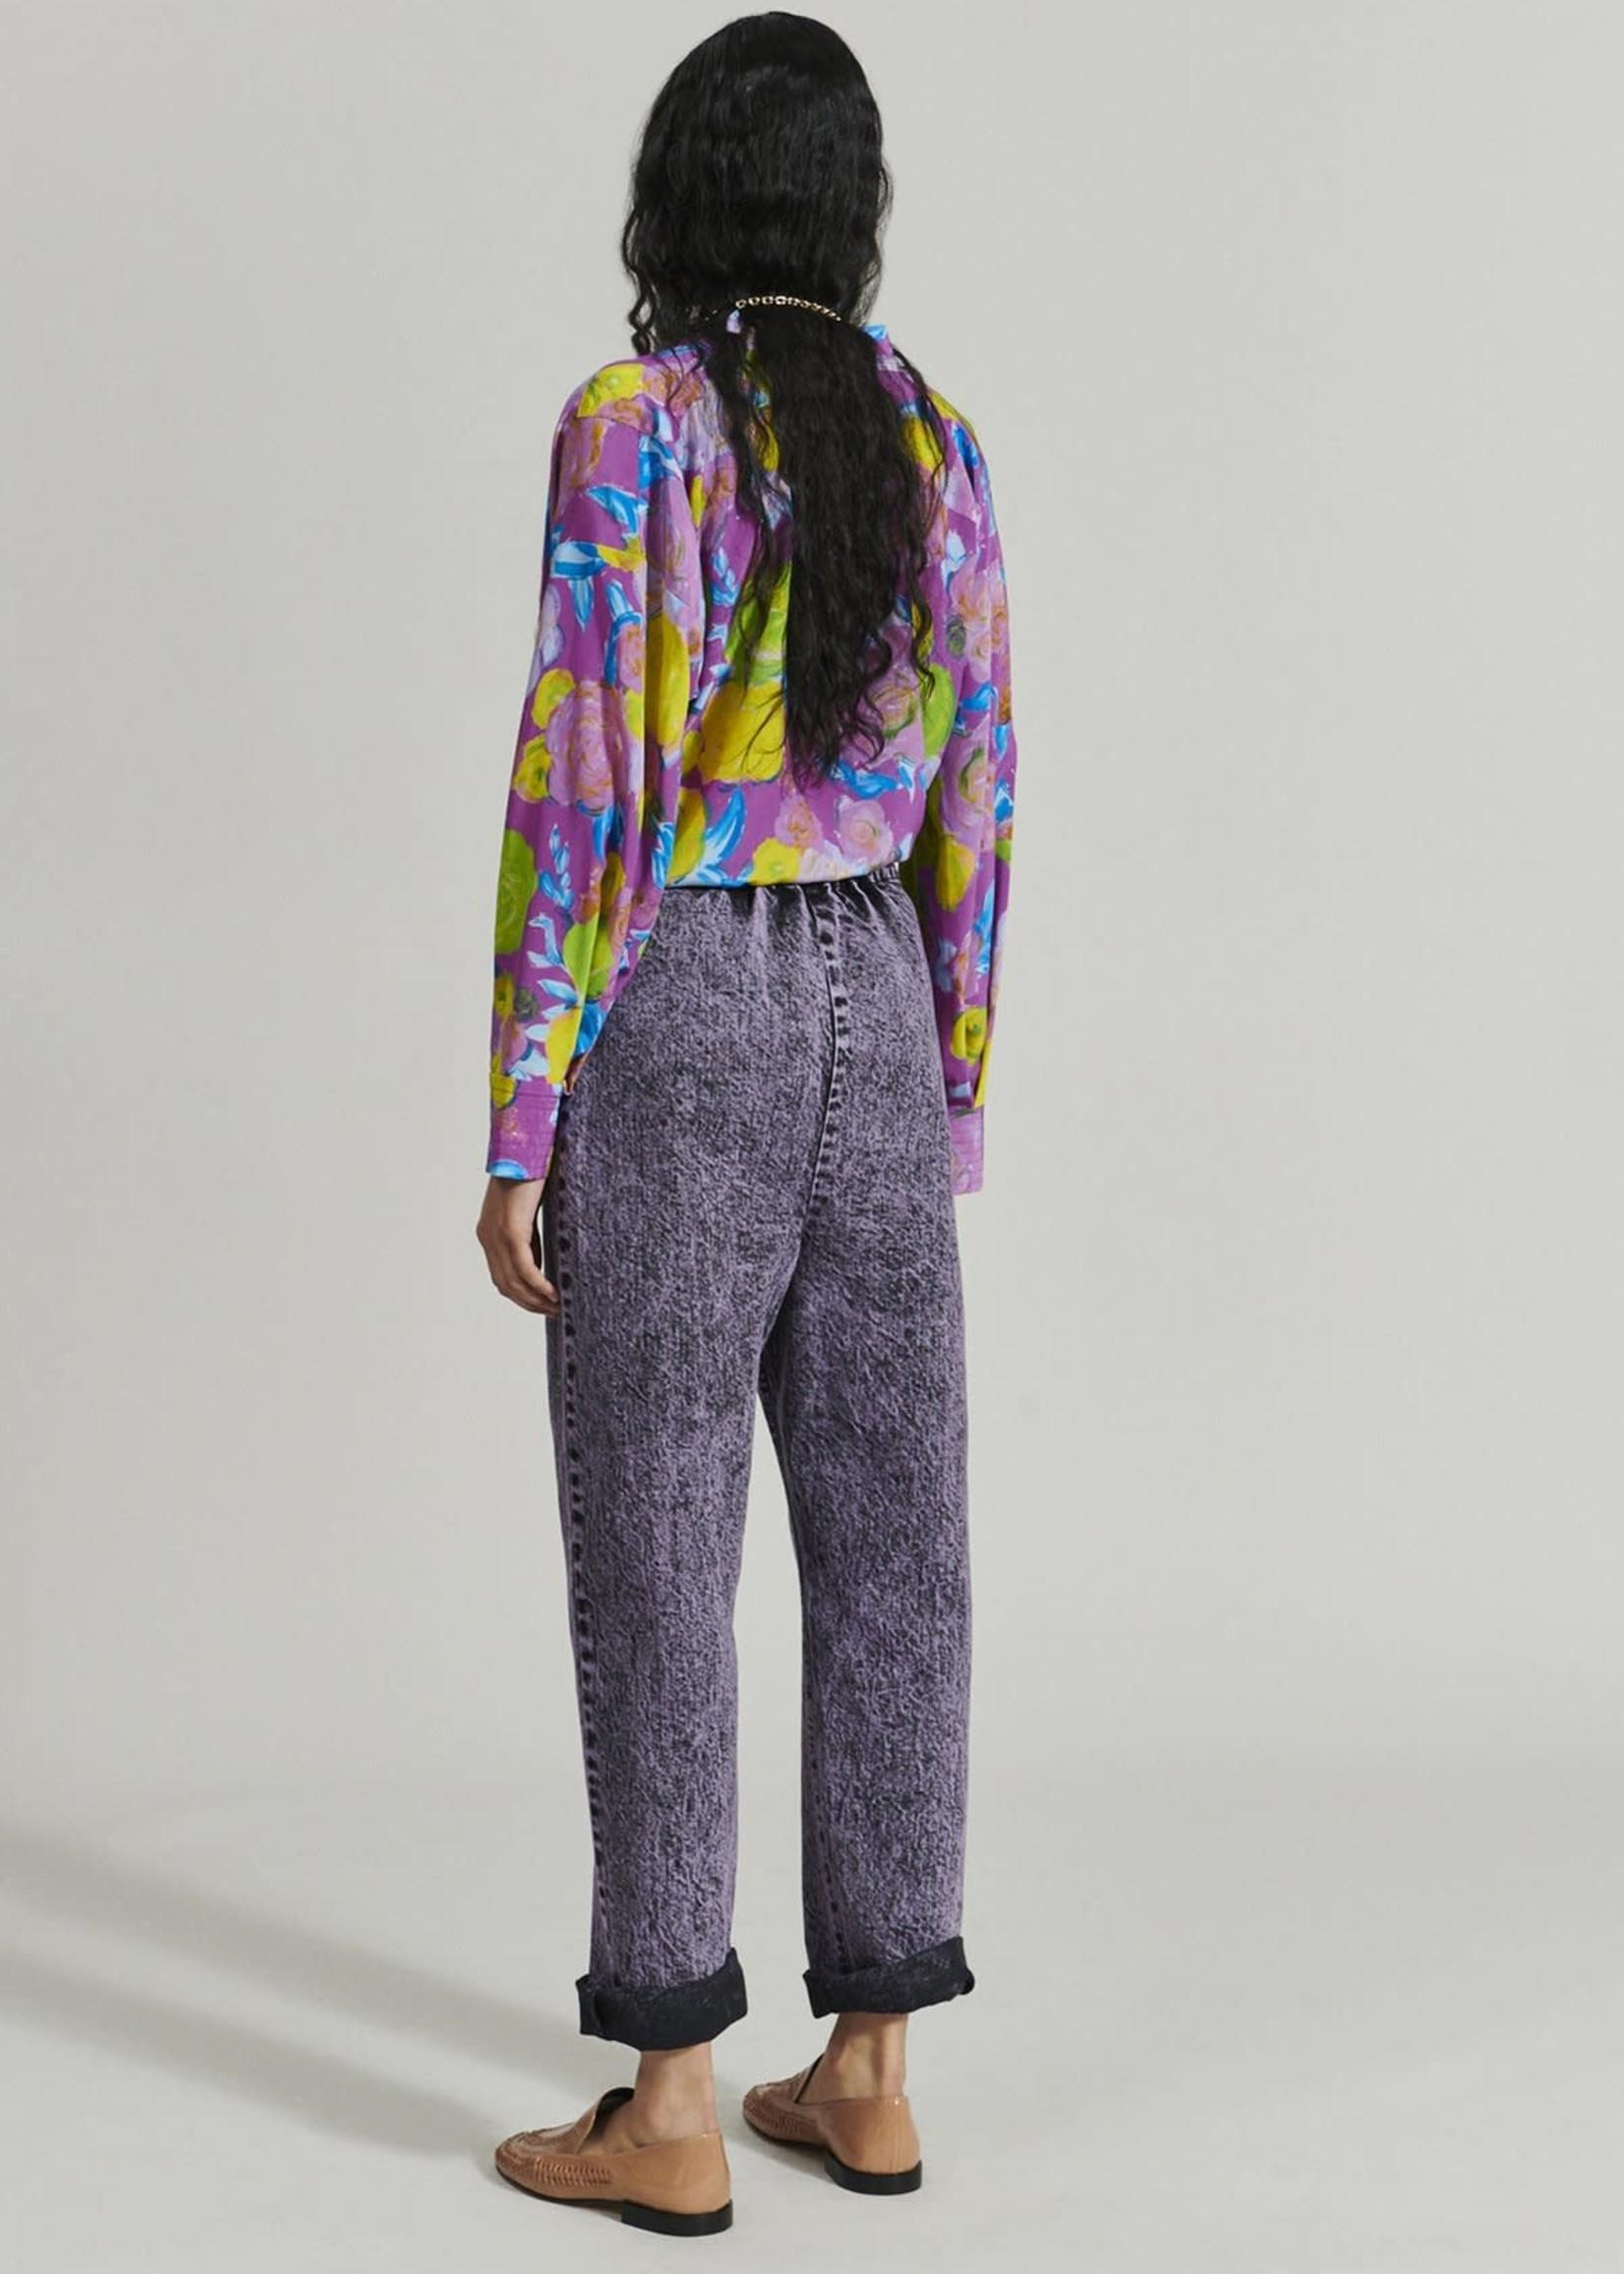 Rachel Comey Barrie Pant in Lavender Acid Wash